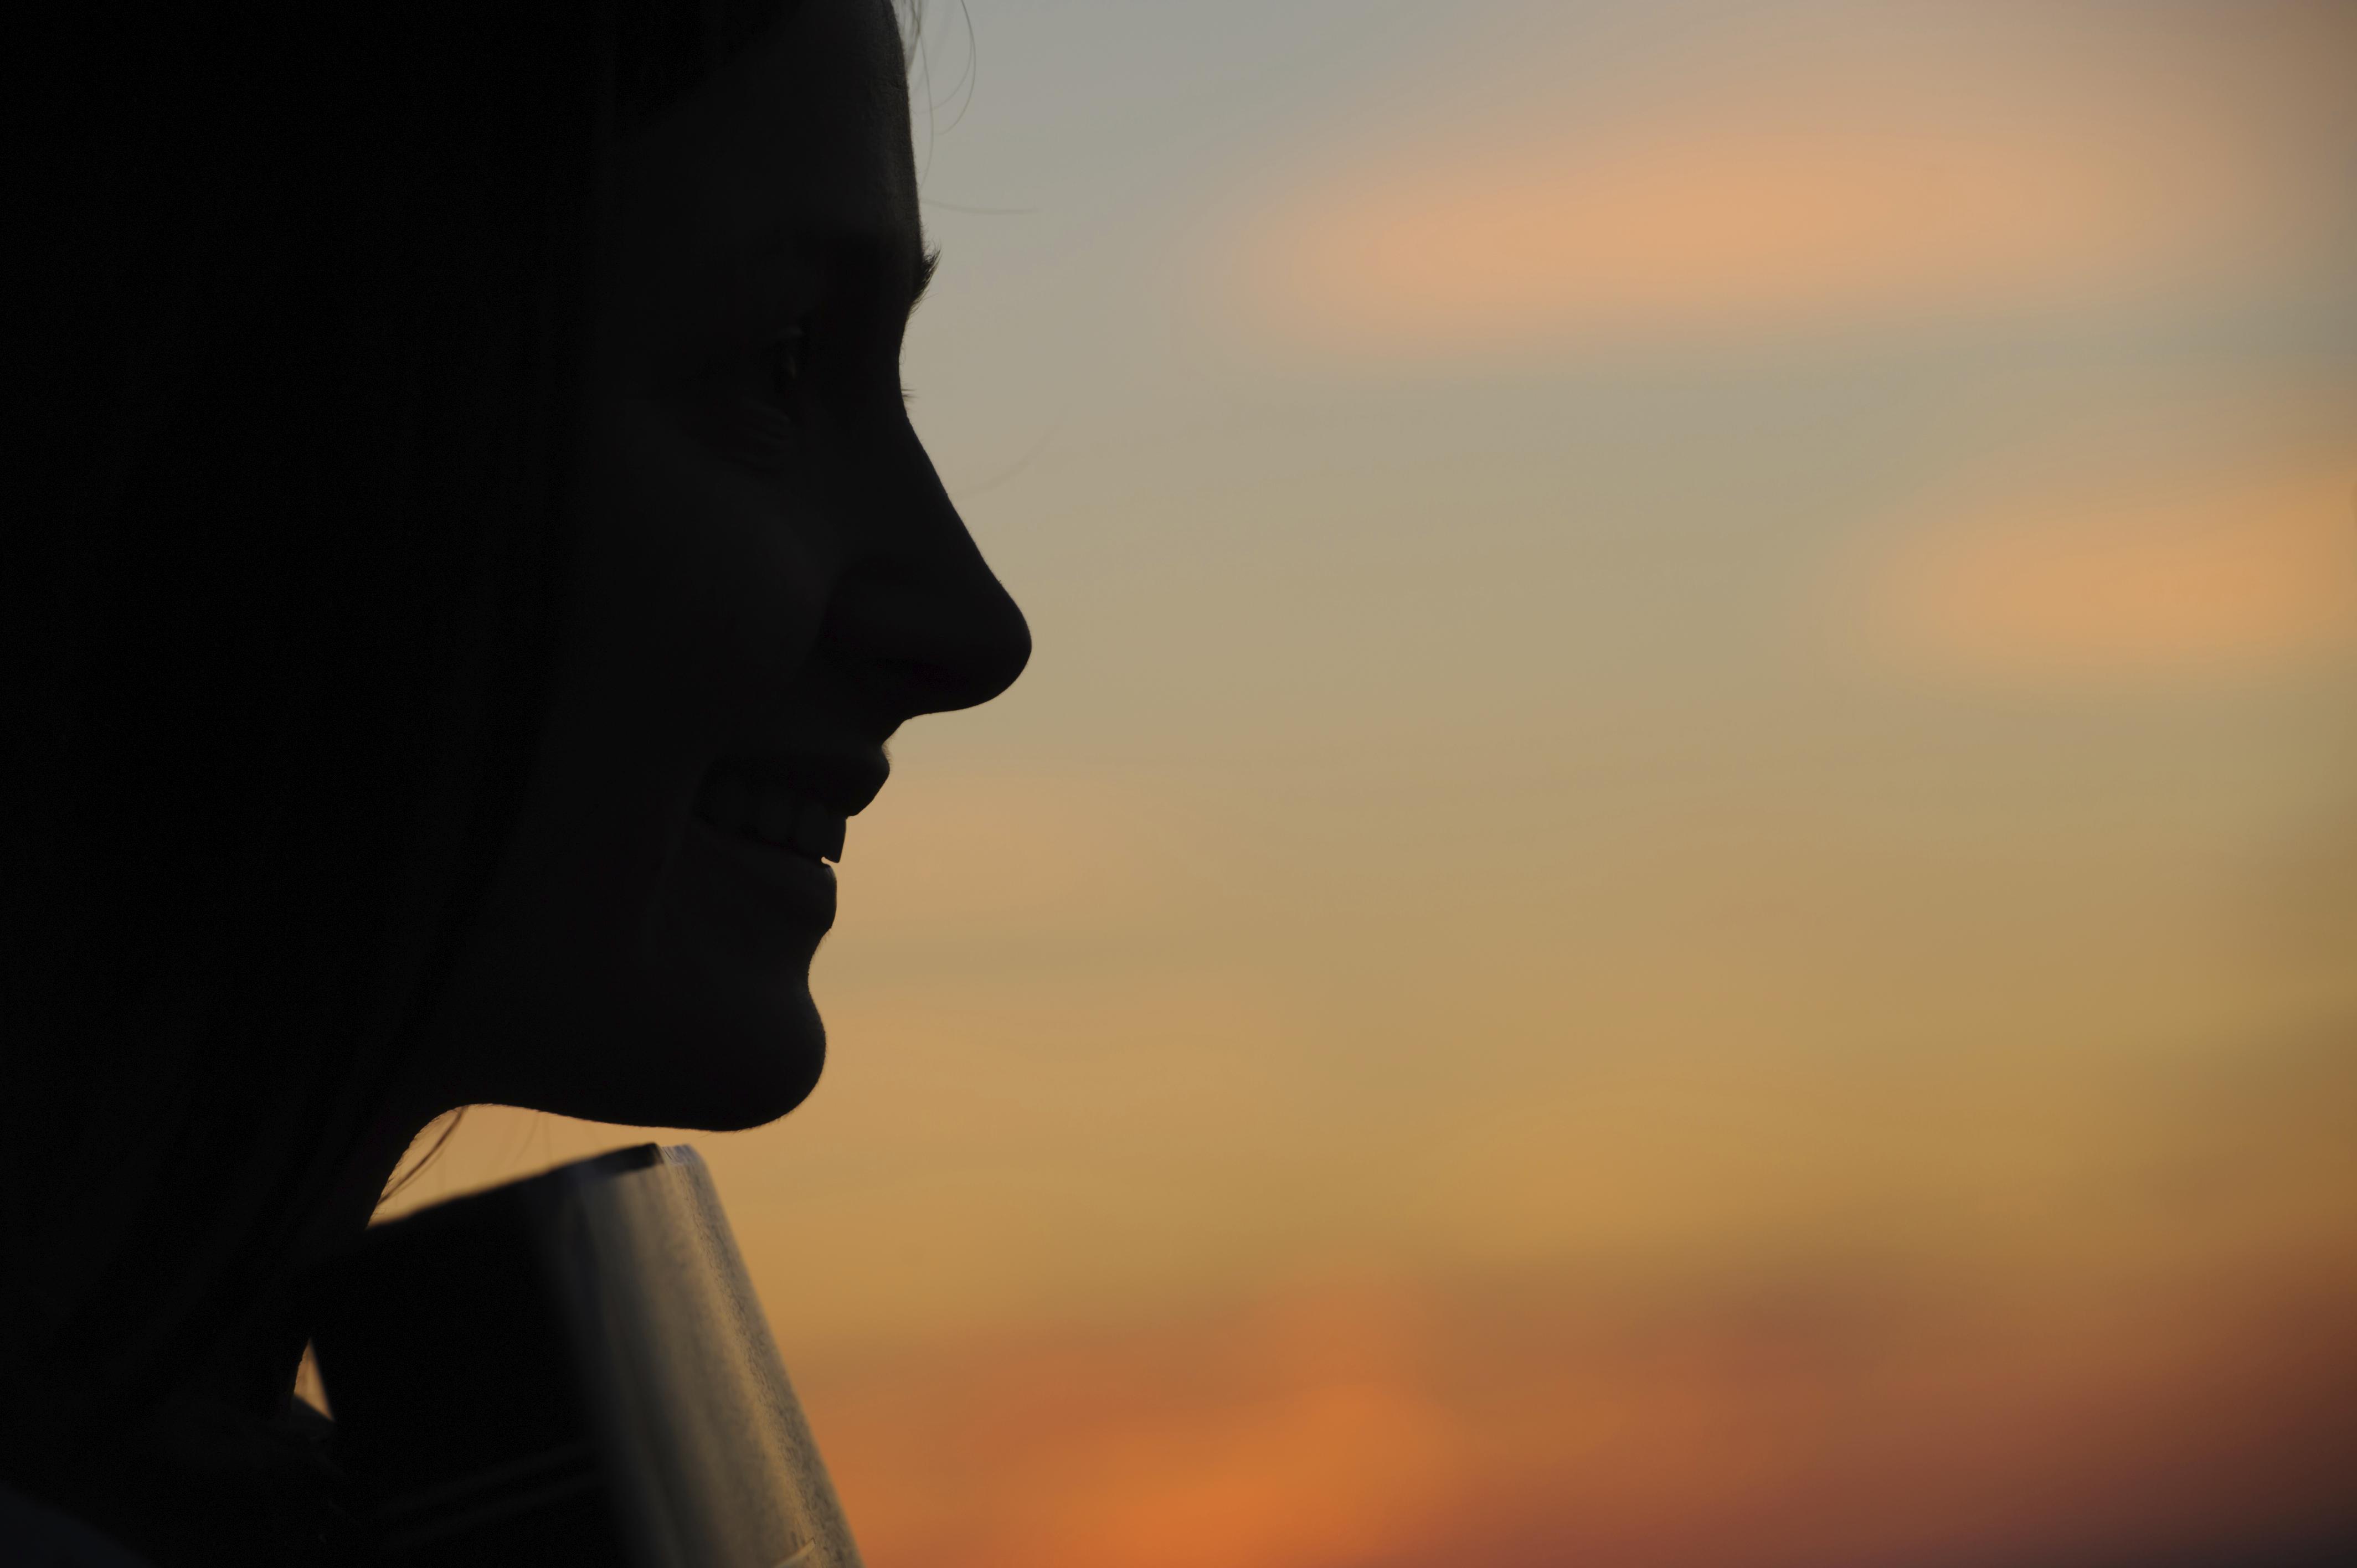 Silhouette in sunset light.